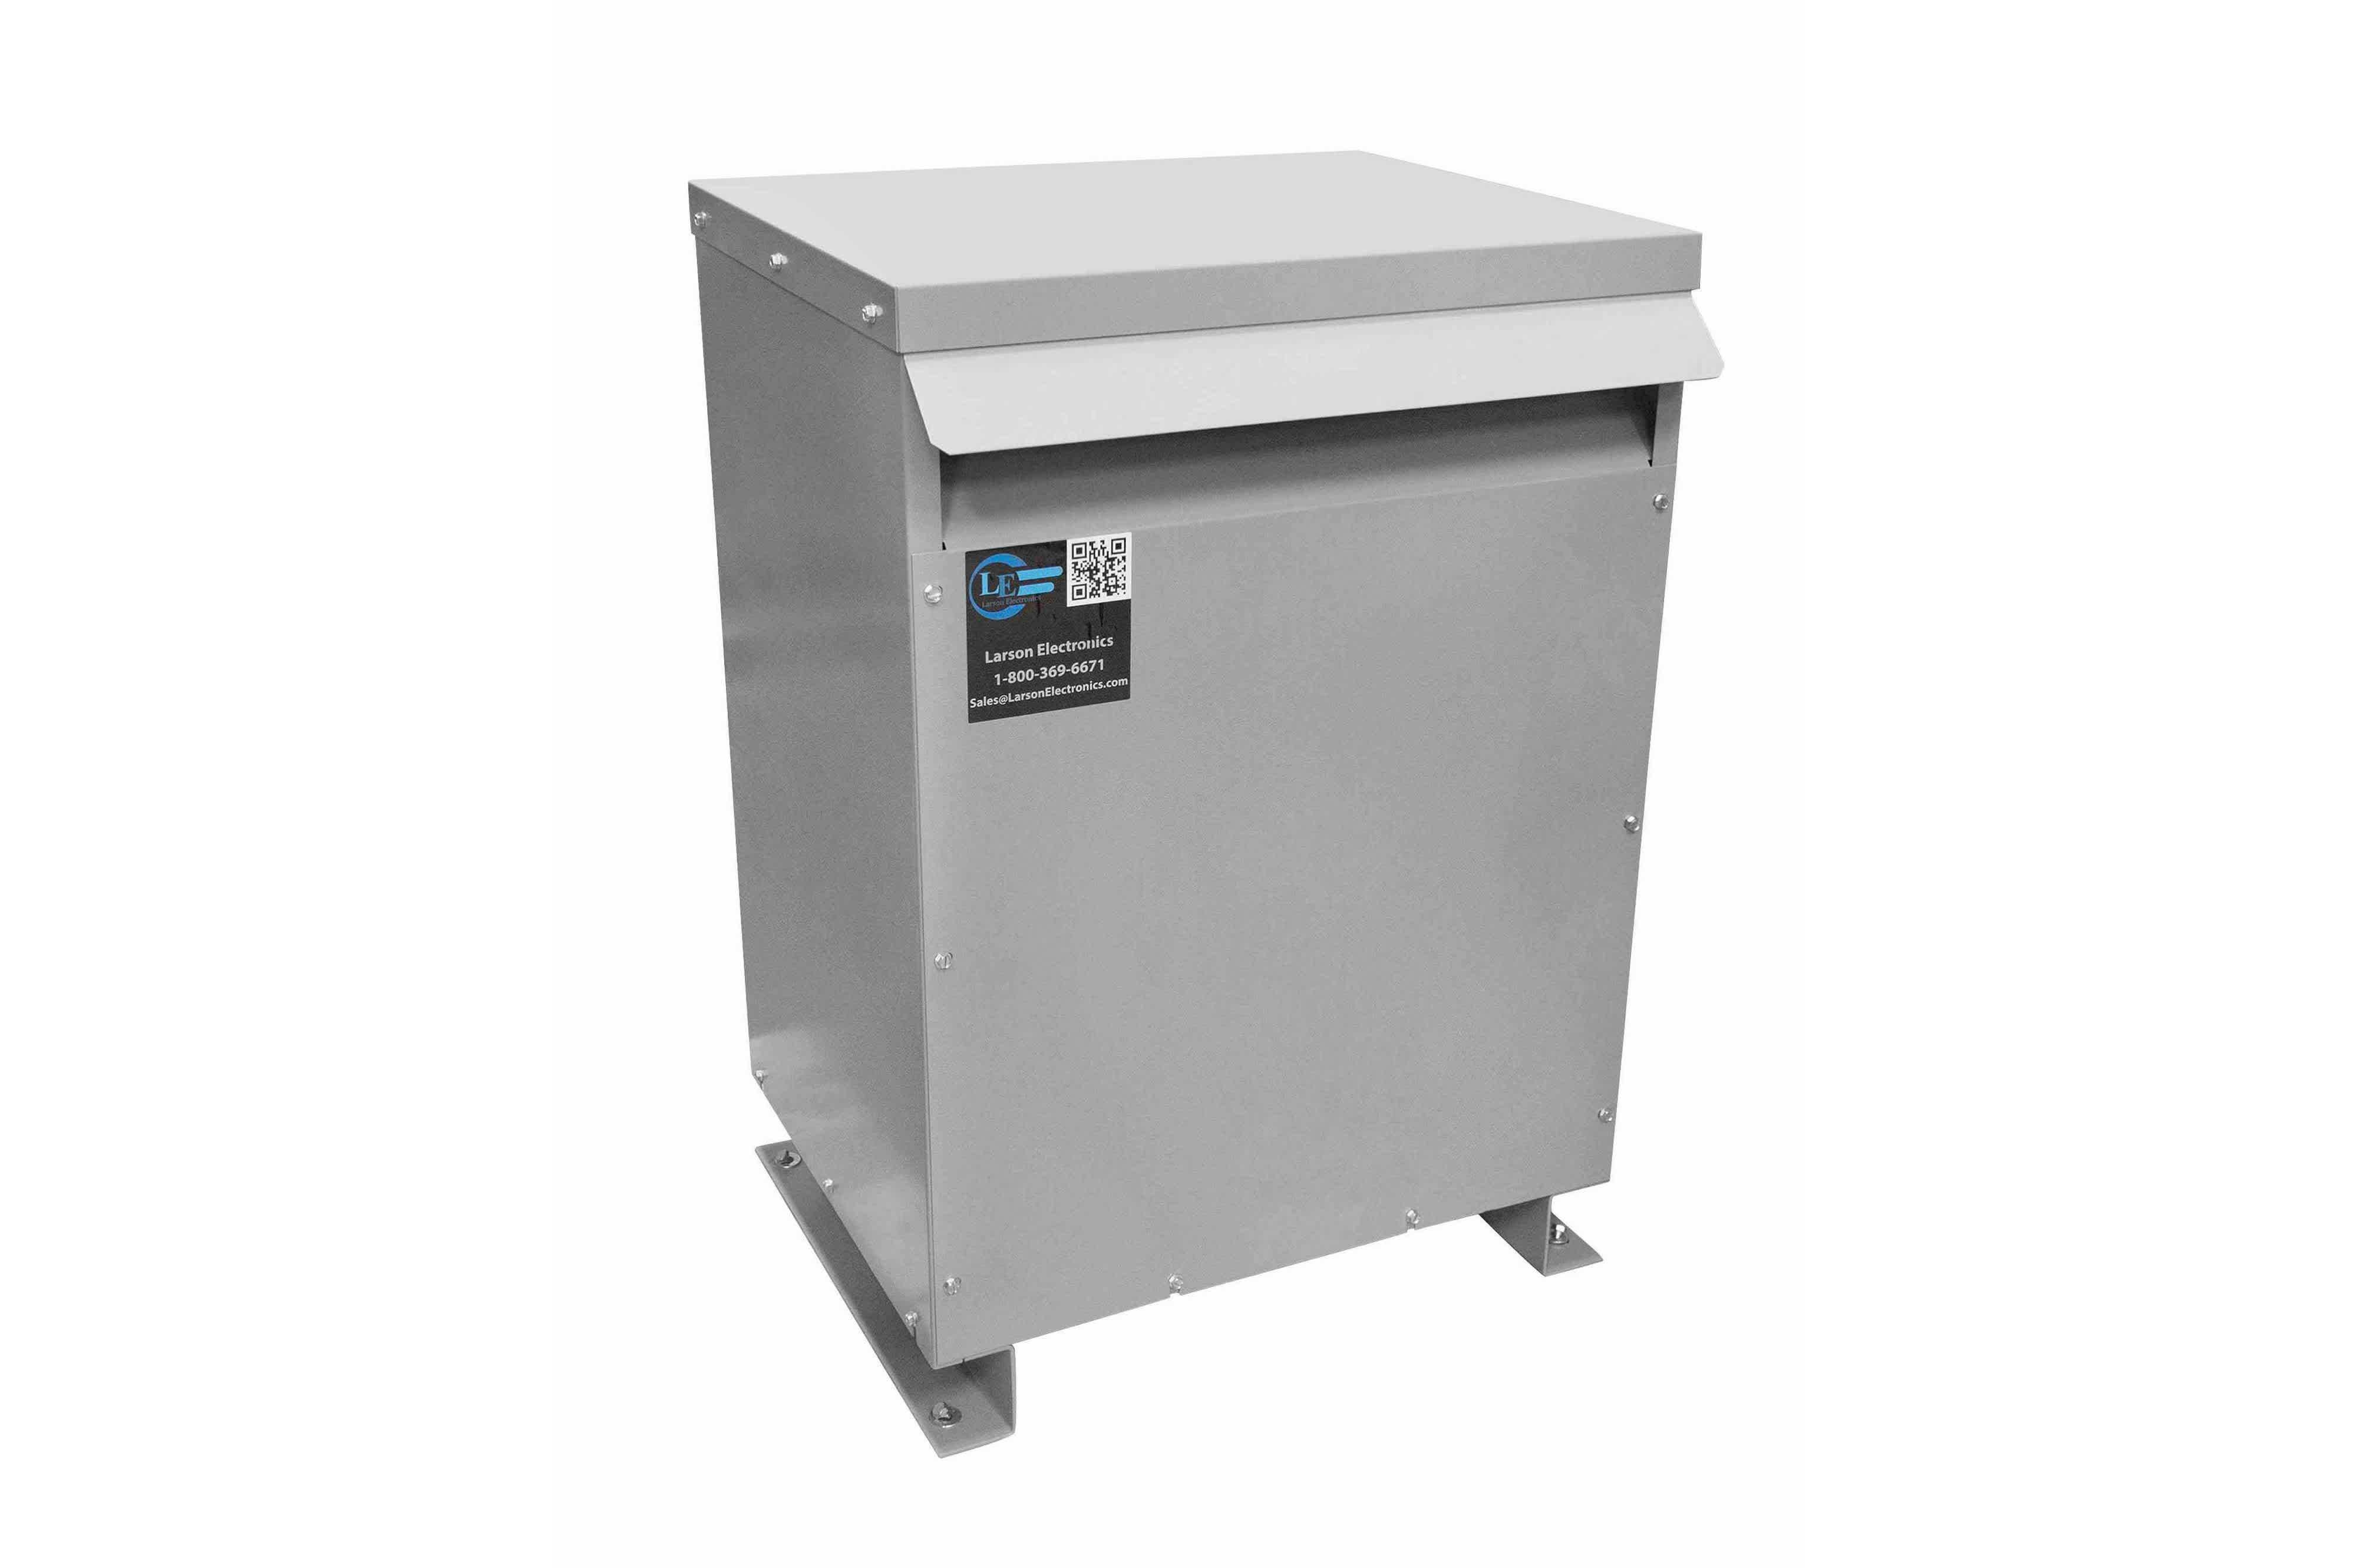 26 kVA 3PH Isolation Transformer, 208V Wye Primary, 208V Delta Secondary, N3R, Ventilated, 60 Hz